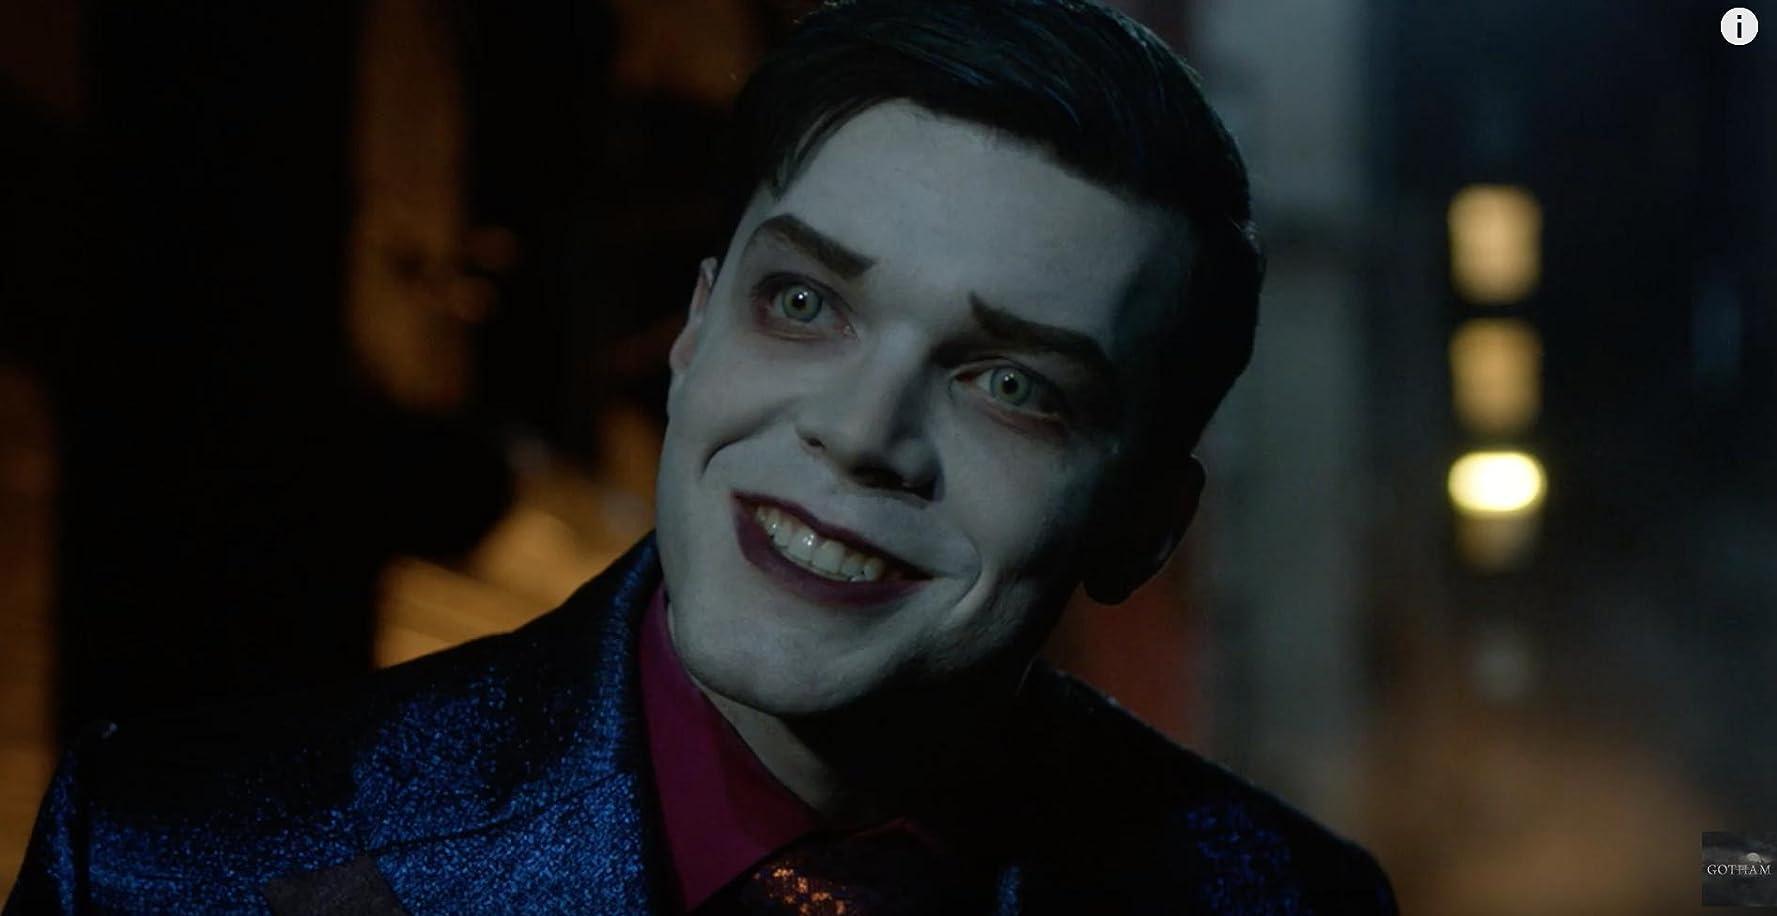 Cameron Monaghan in Gotham (2014)